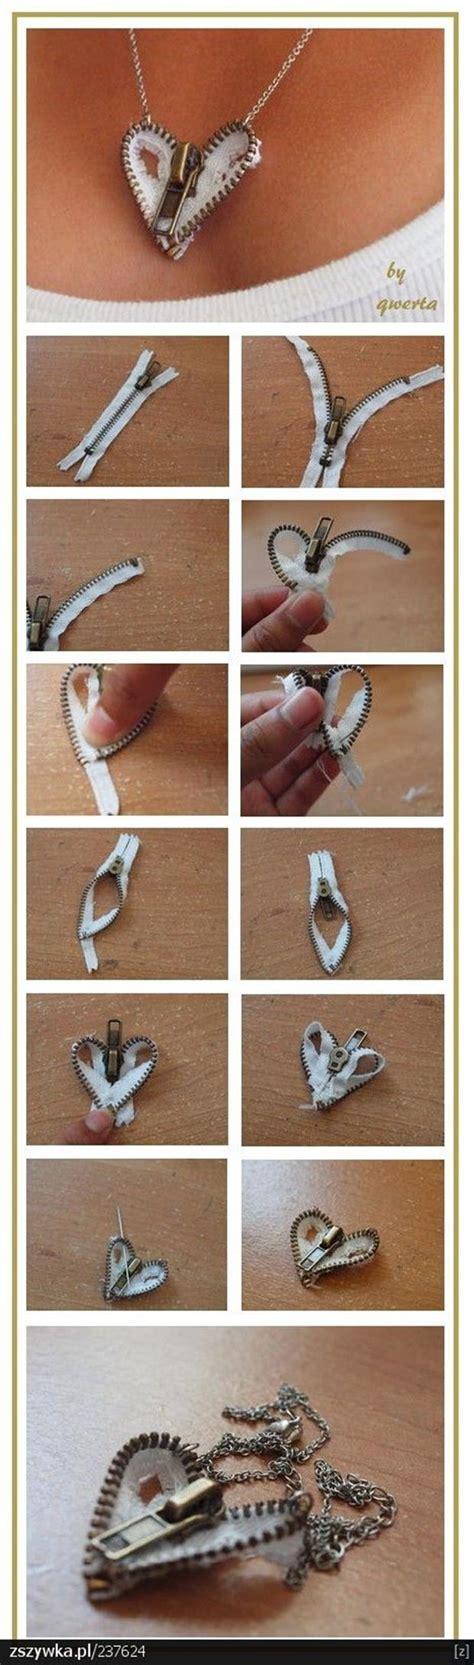 simple ideas   borderline crafty  pics